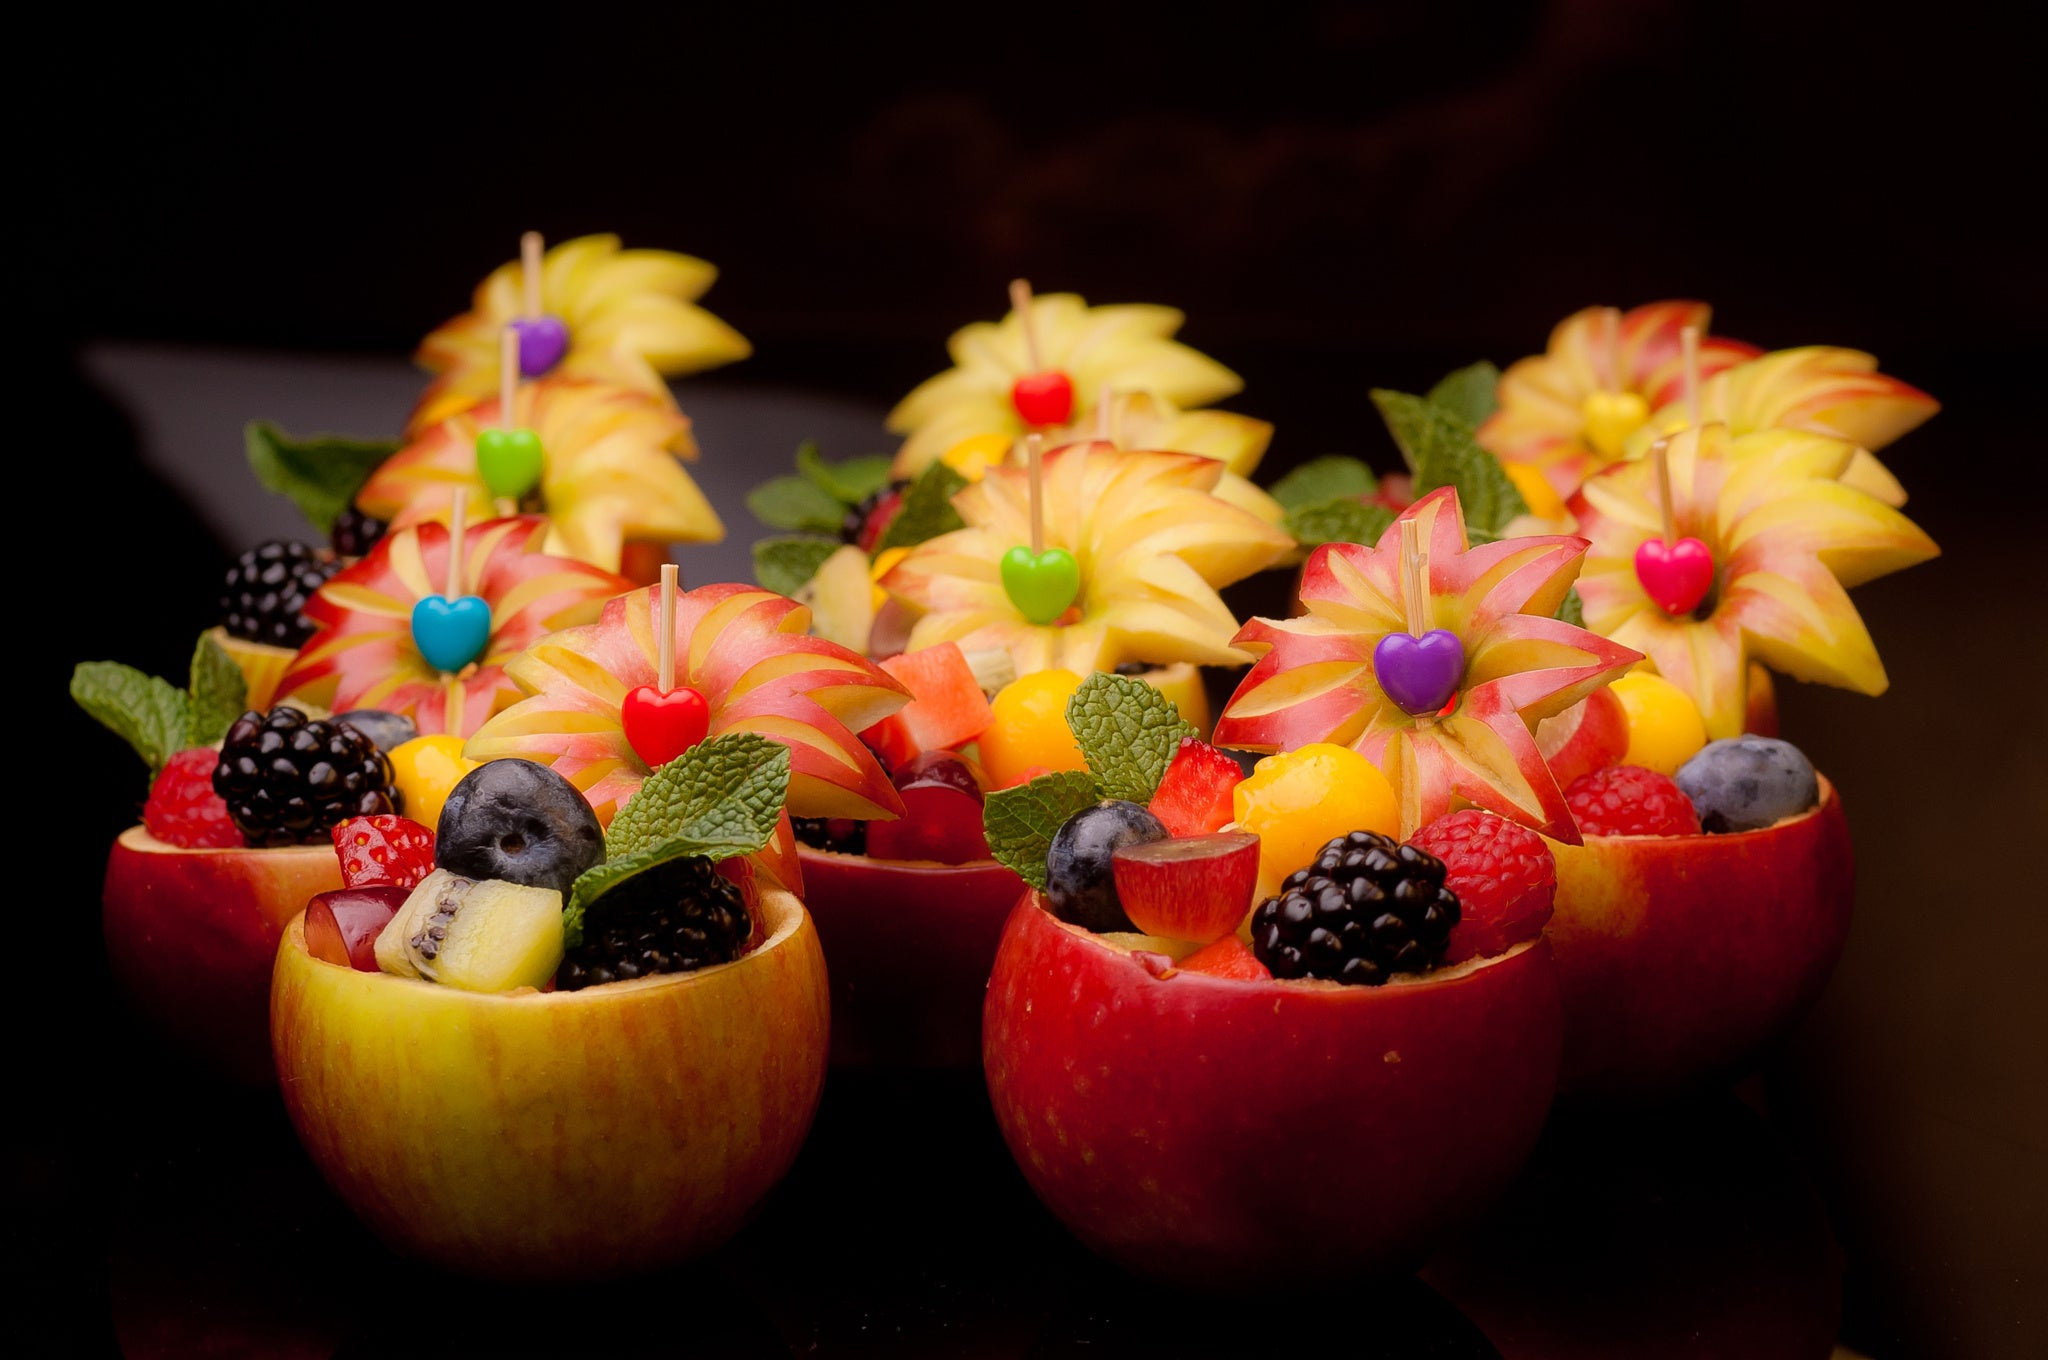 fruit dessert food